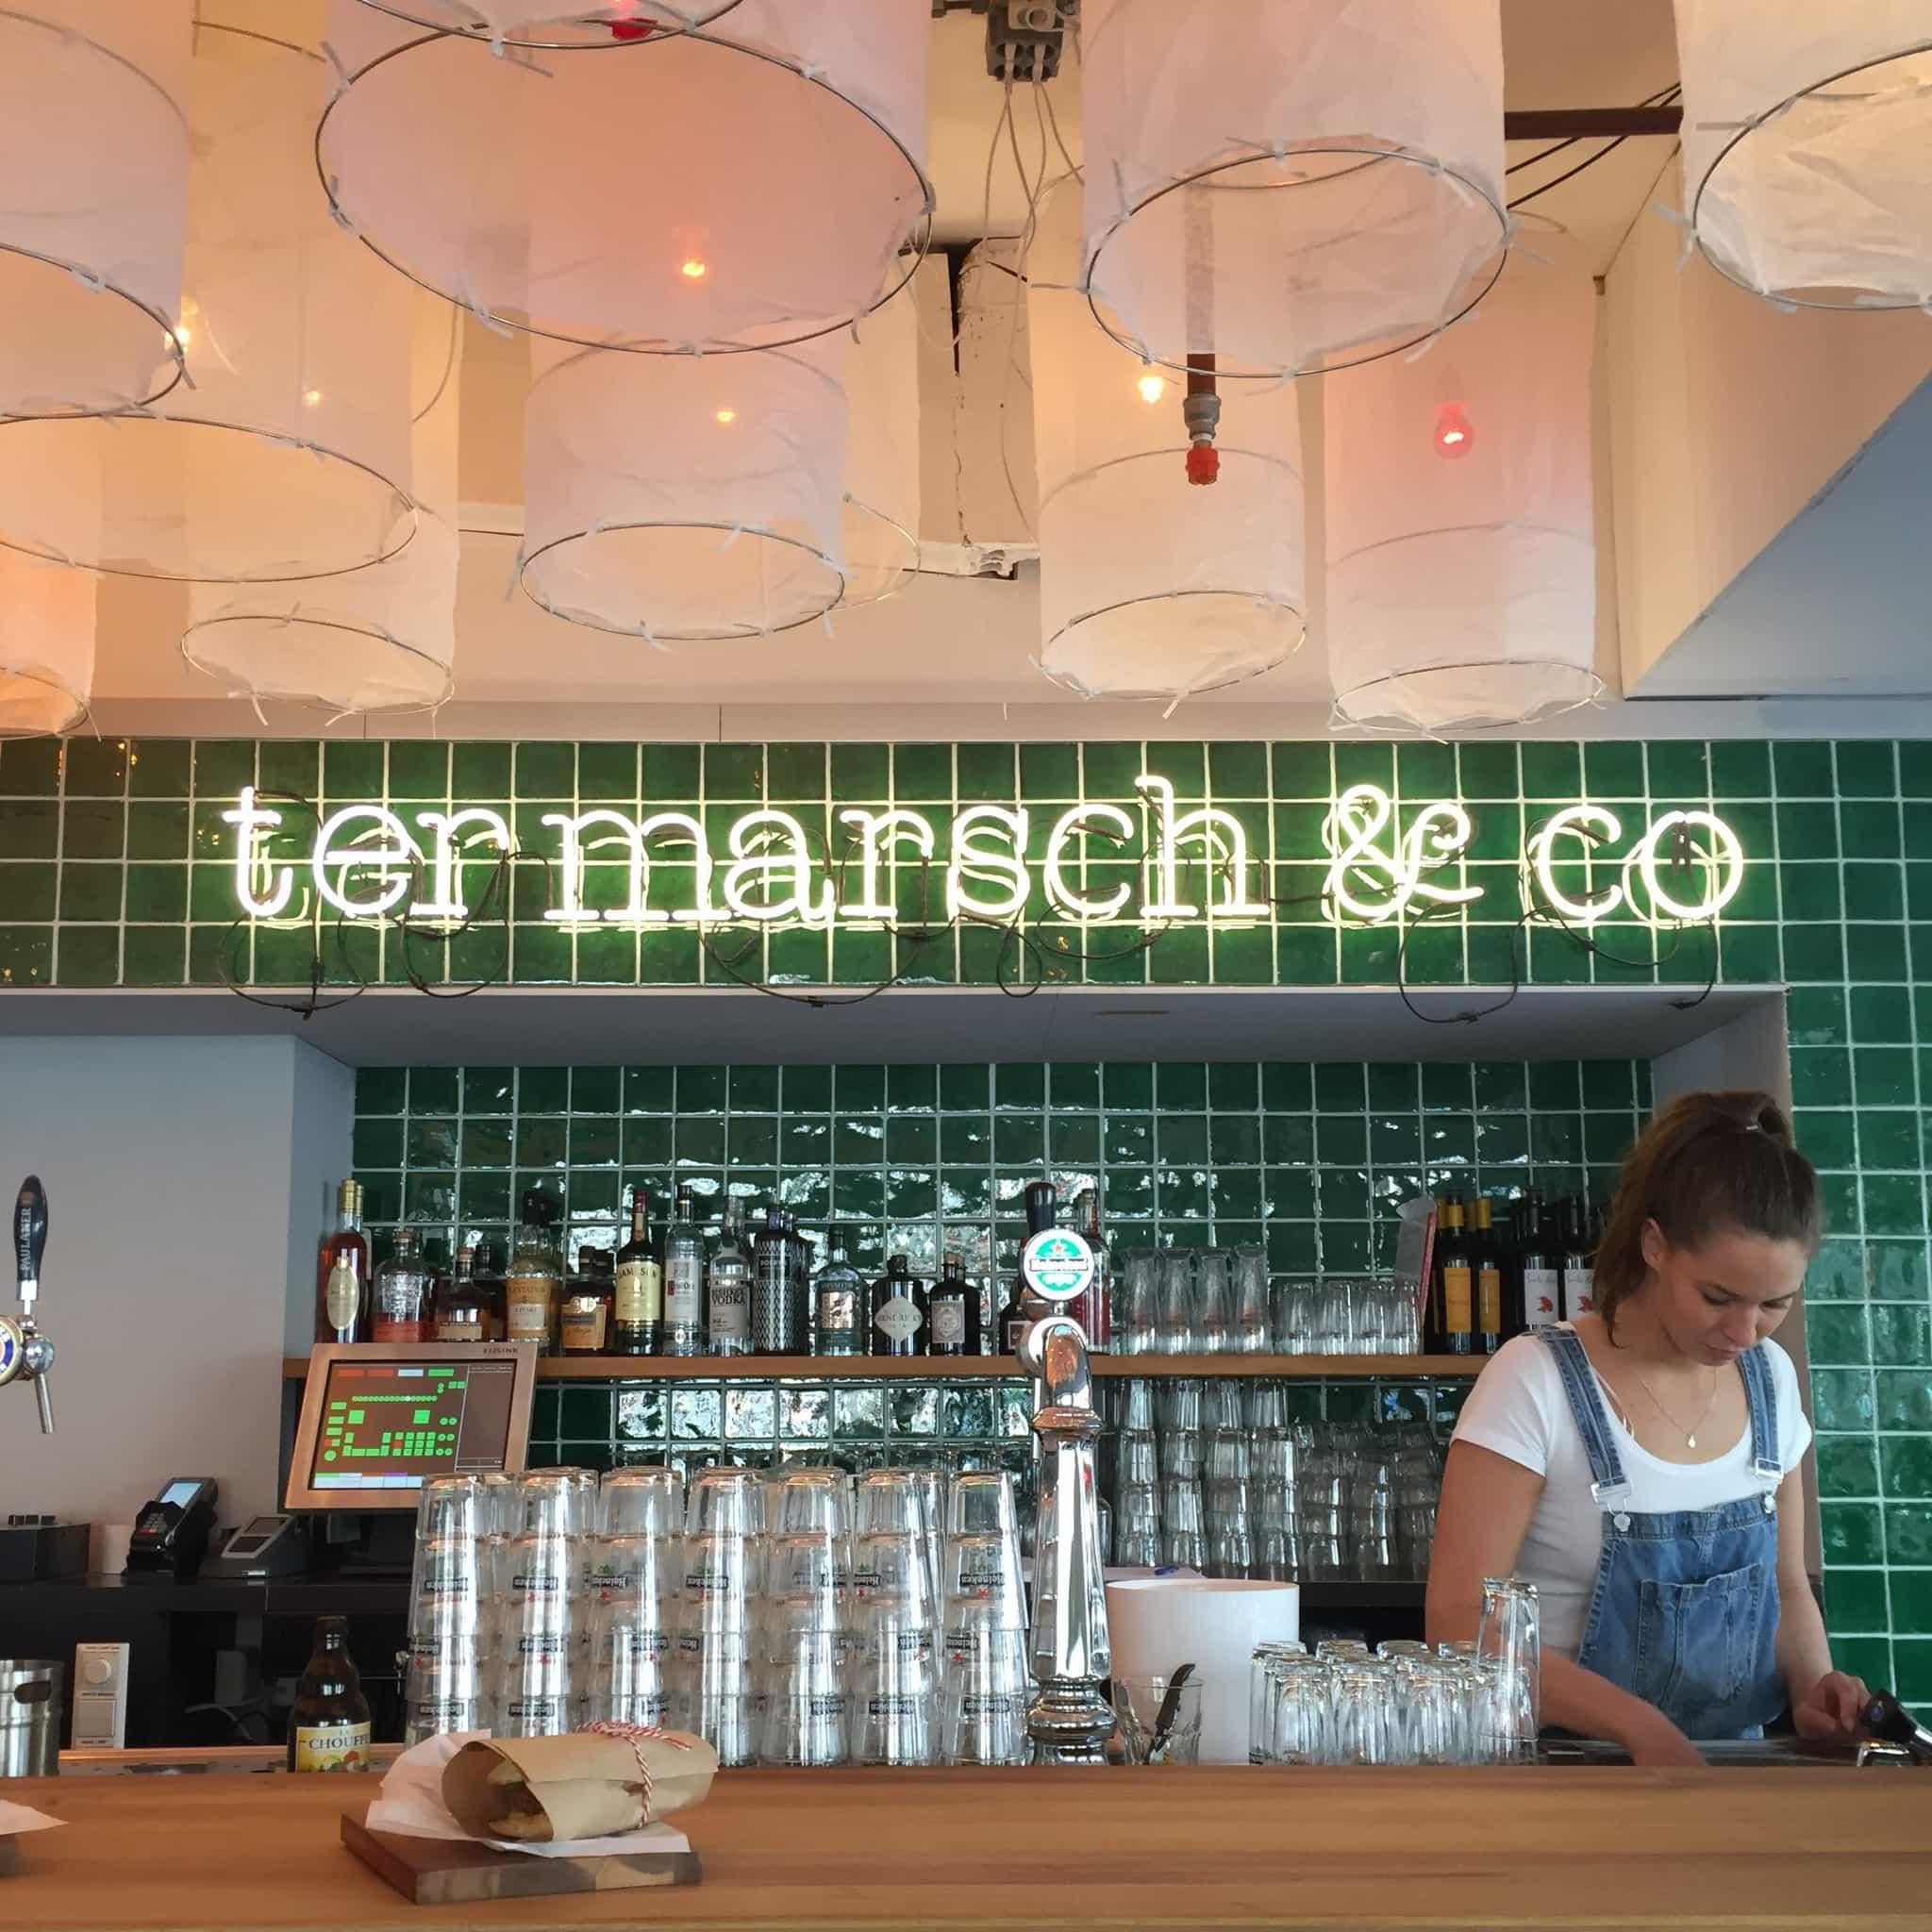 IMG 1782 e1456948905392 - Ter Marsch & Co goes Amsterdam - 020 tip